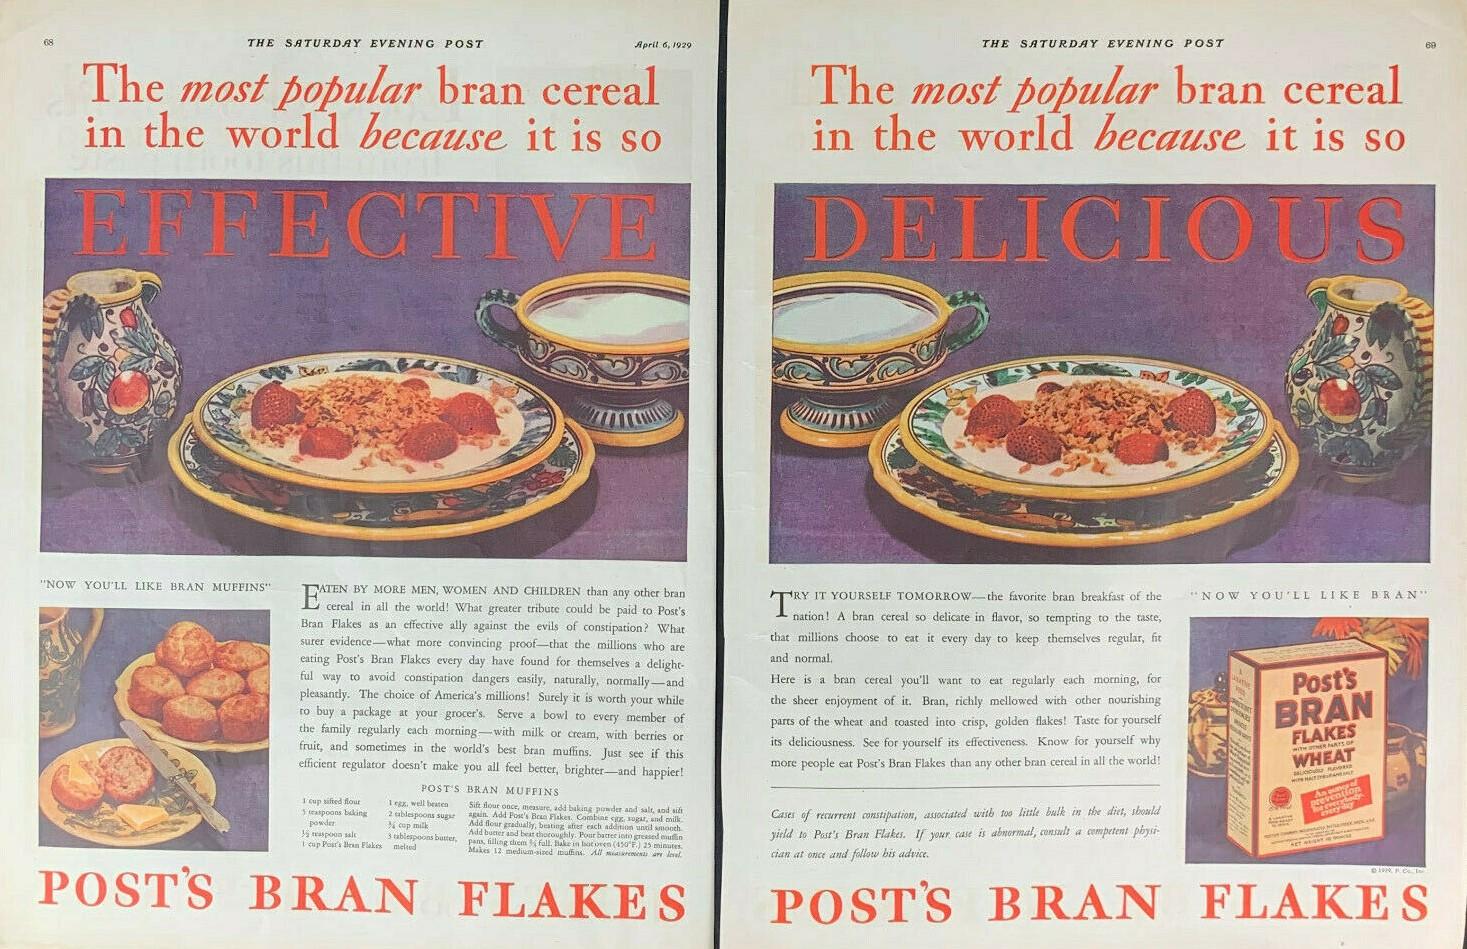 1929 POST BRAN FLAKES